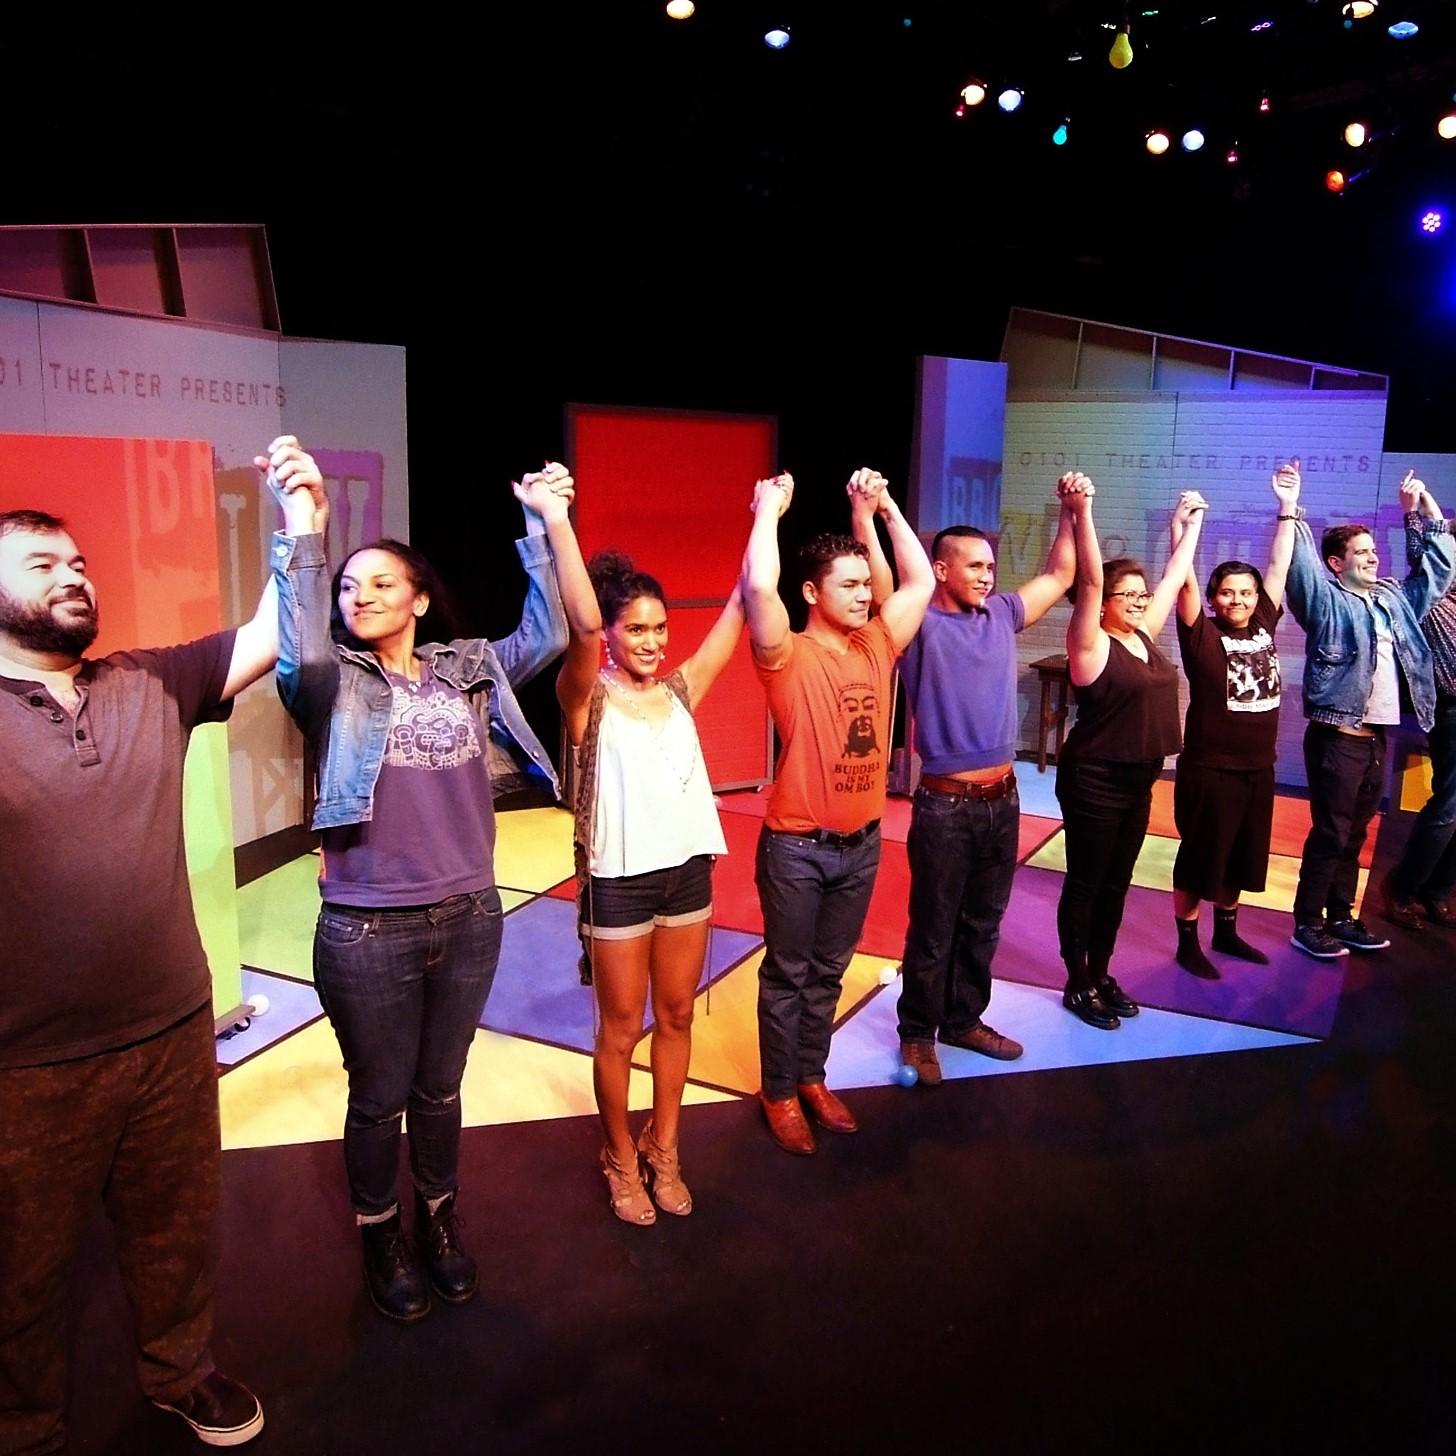 CASA 0101 - Community Theater & Youth Drama Program